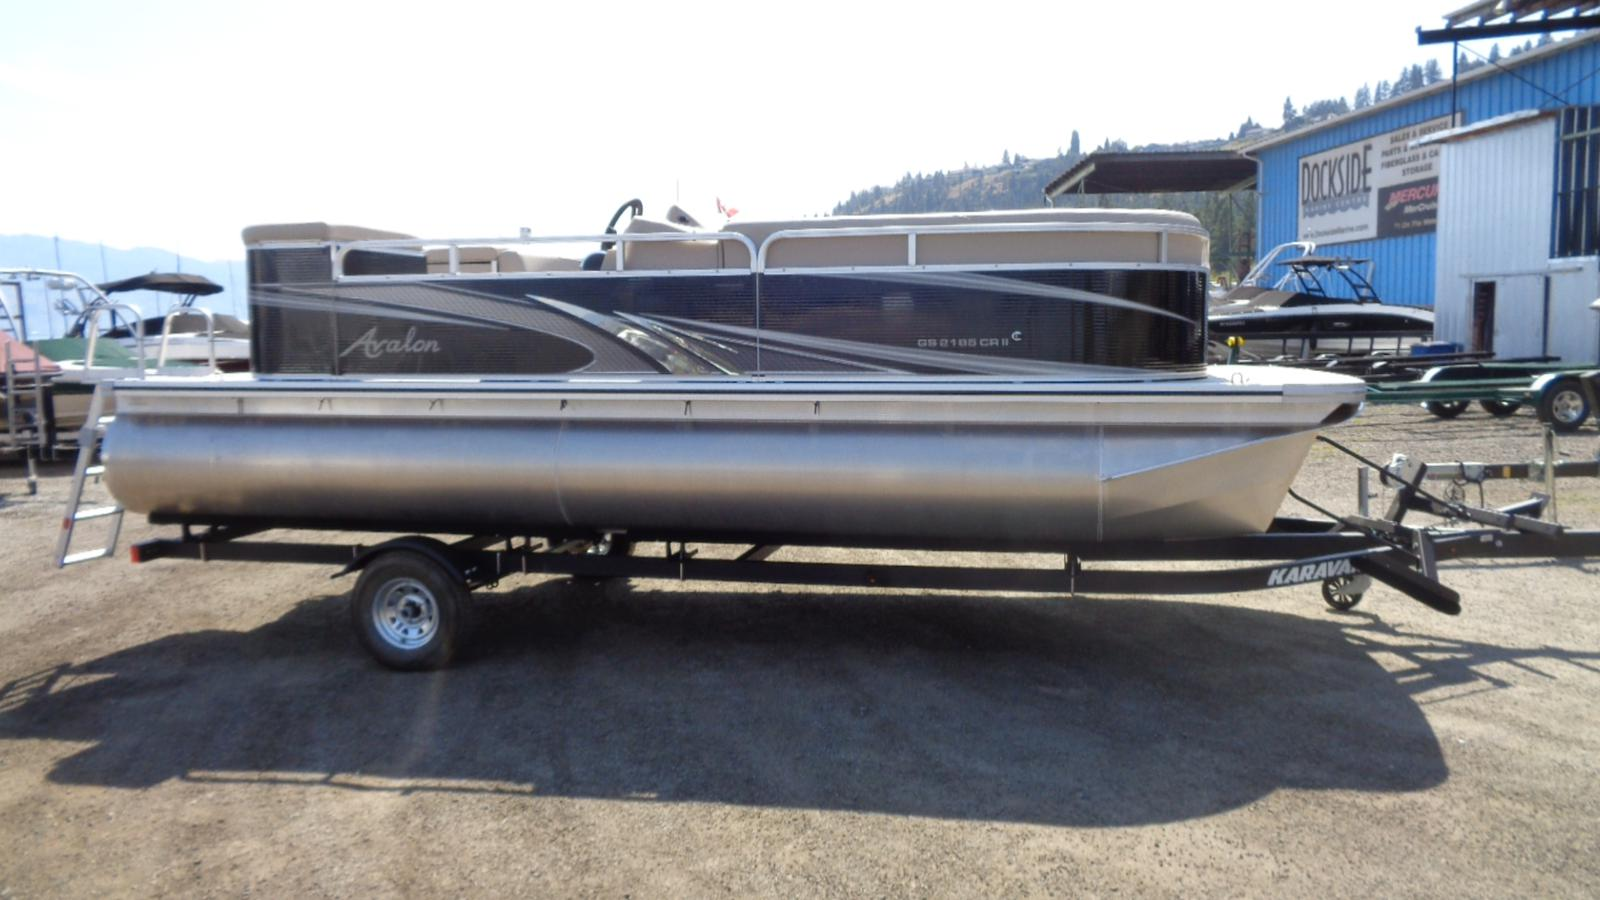 For Sale: 2018 Avalon 21 Gs Cruise 22ft<br/>Dockside Marine Centre, LTD.